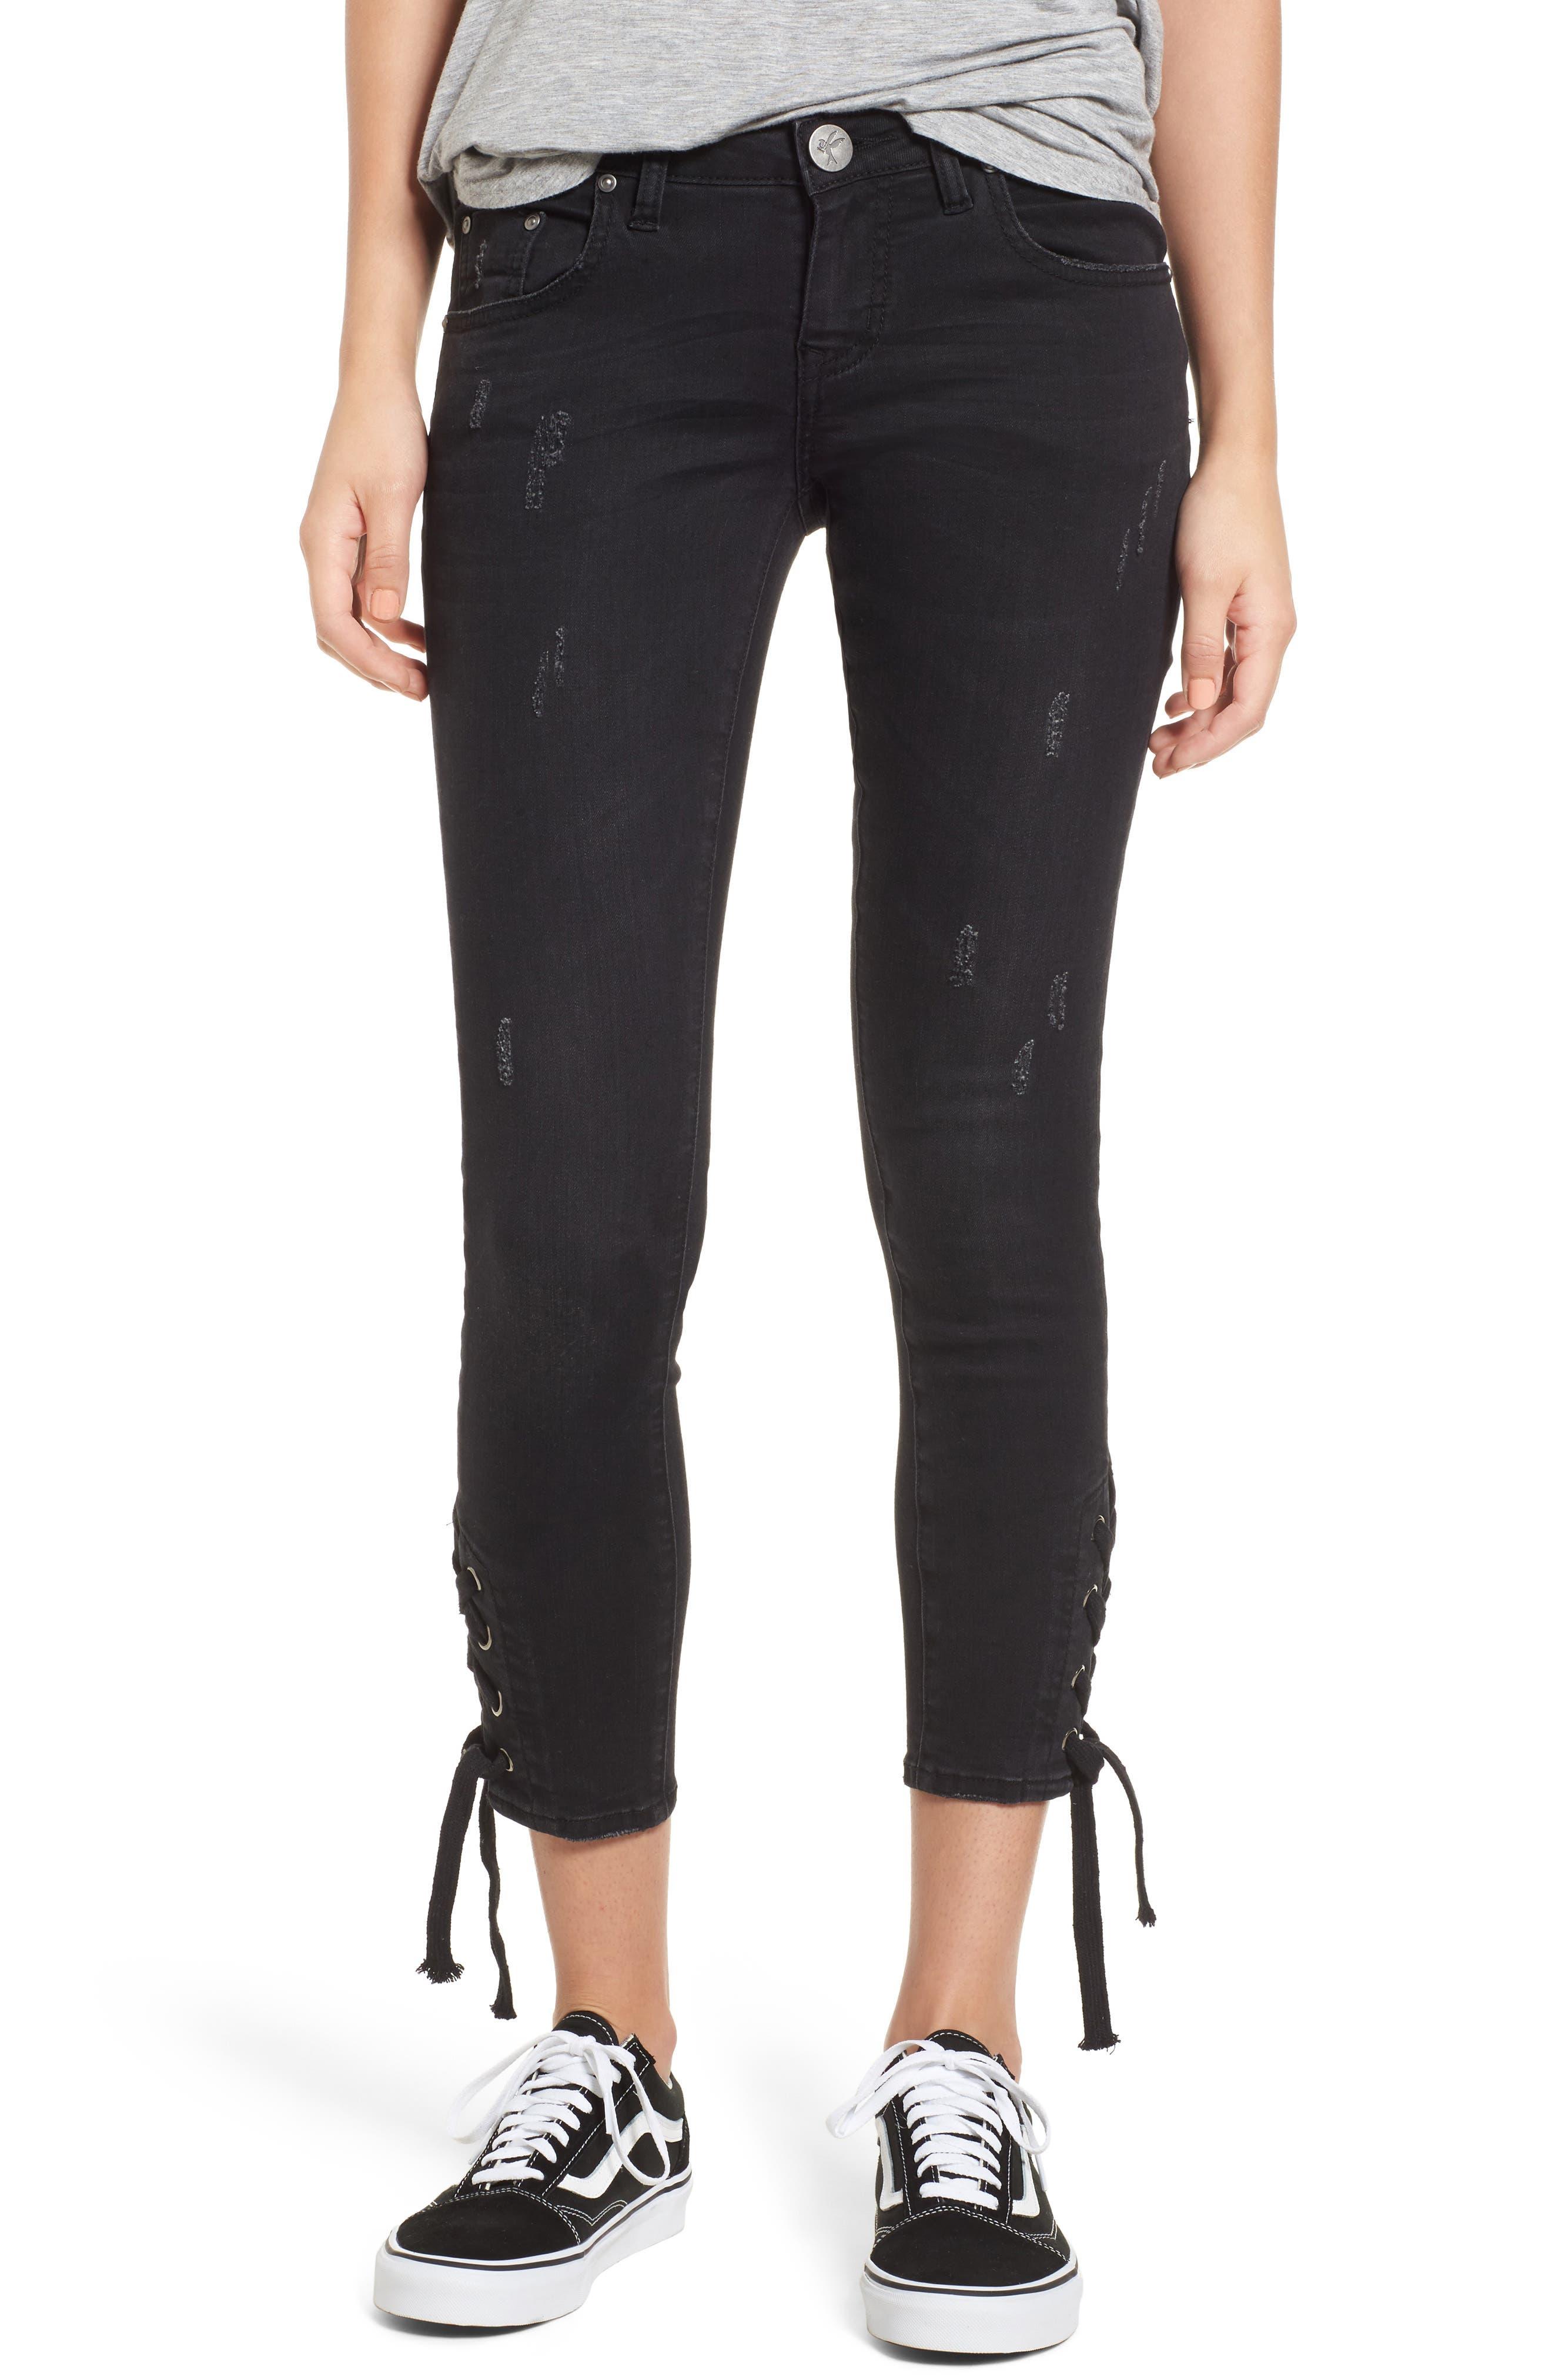 Freebirds Side Tie Crop Skinny Jeans,                         Main,                         color, Black Paris